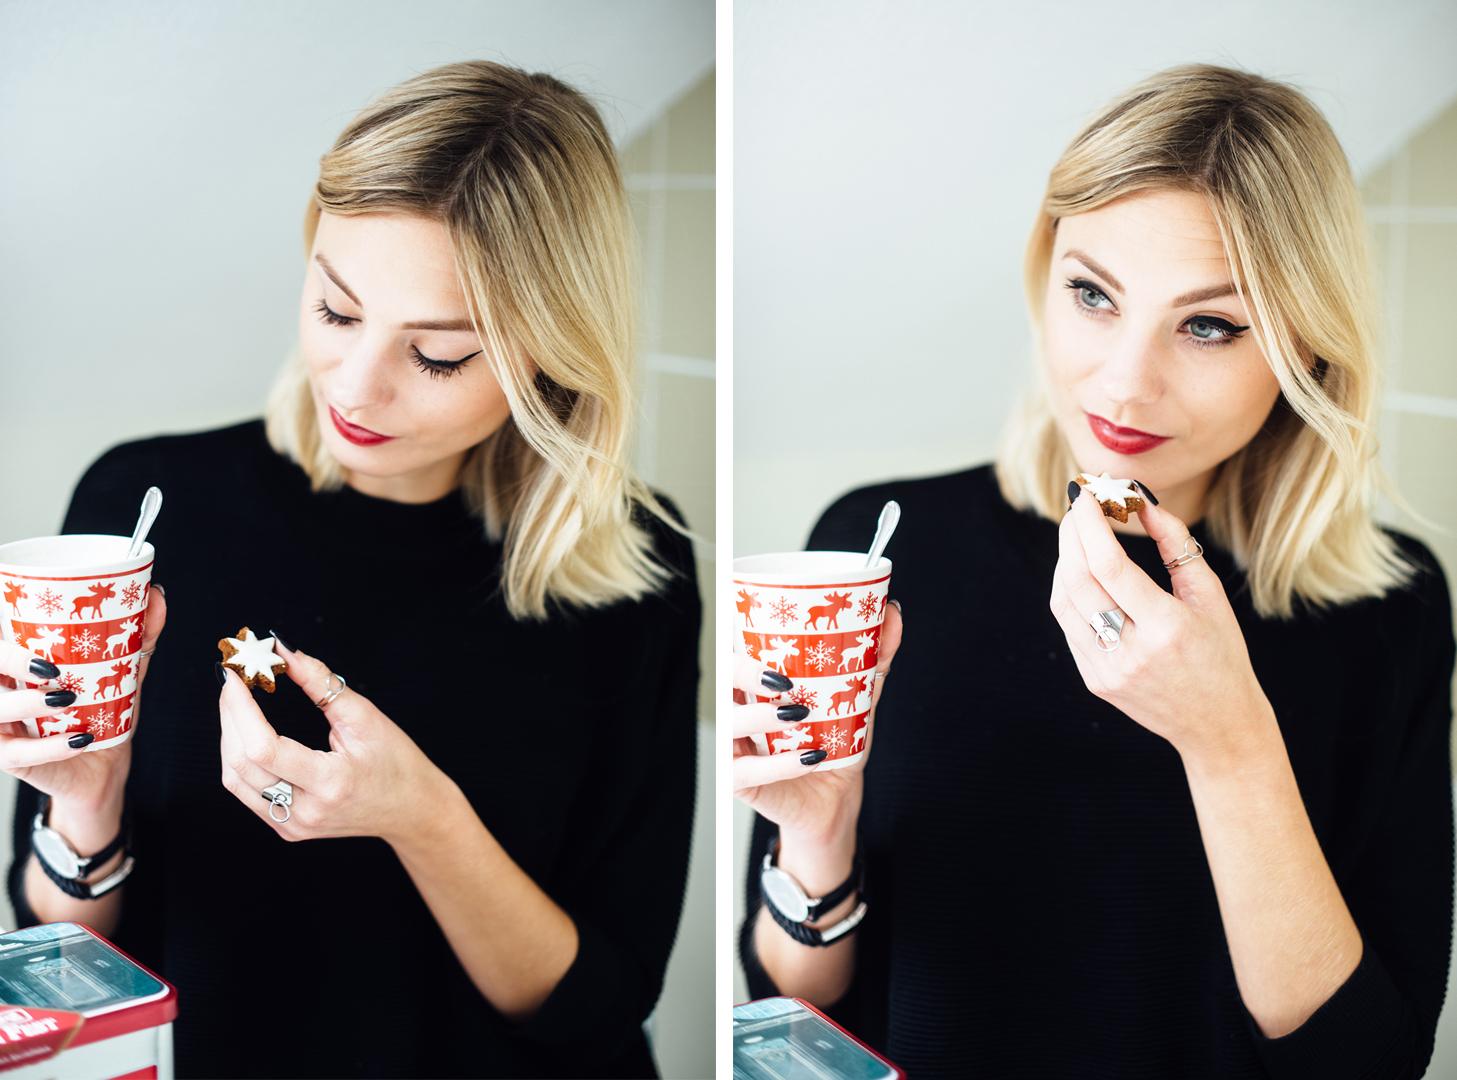 lambertz-geschenktruhe_erfahrung_review_weihnachten_outfit_inspiration_fashionblog_modeblog_kiamisu-collage